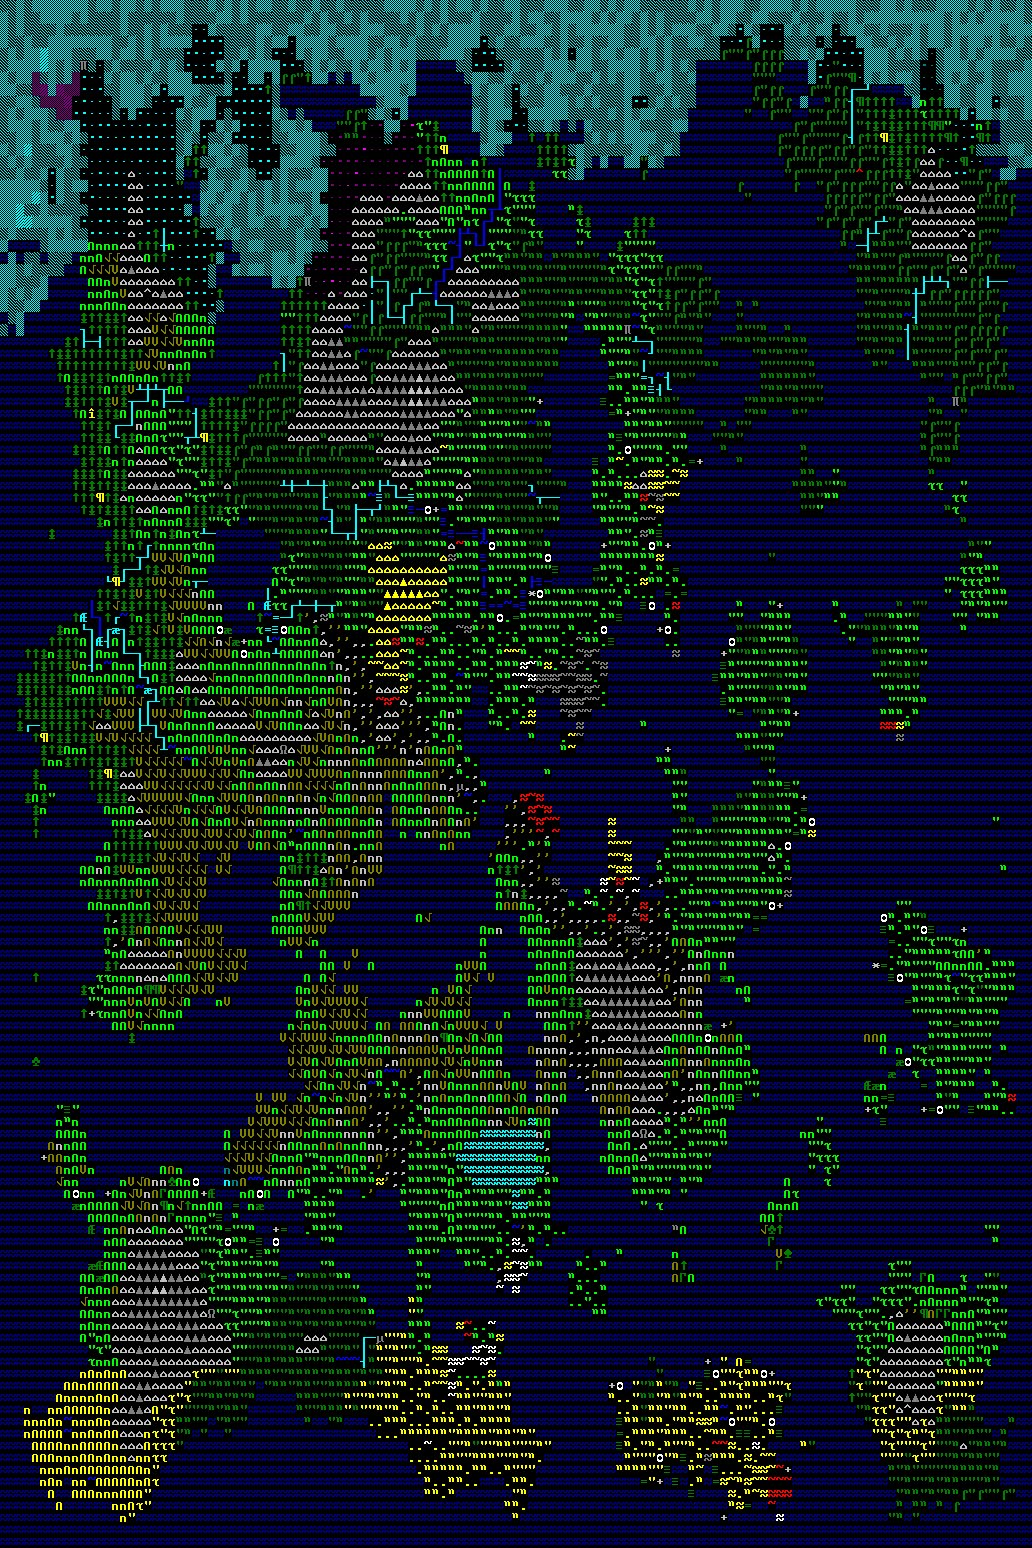 [Image: world_map-region1-125--10081.bmp]